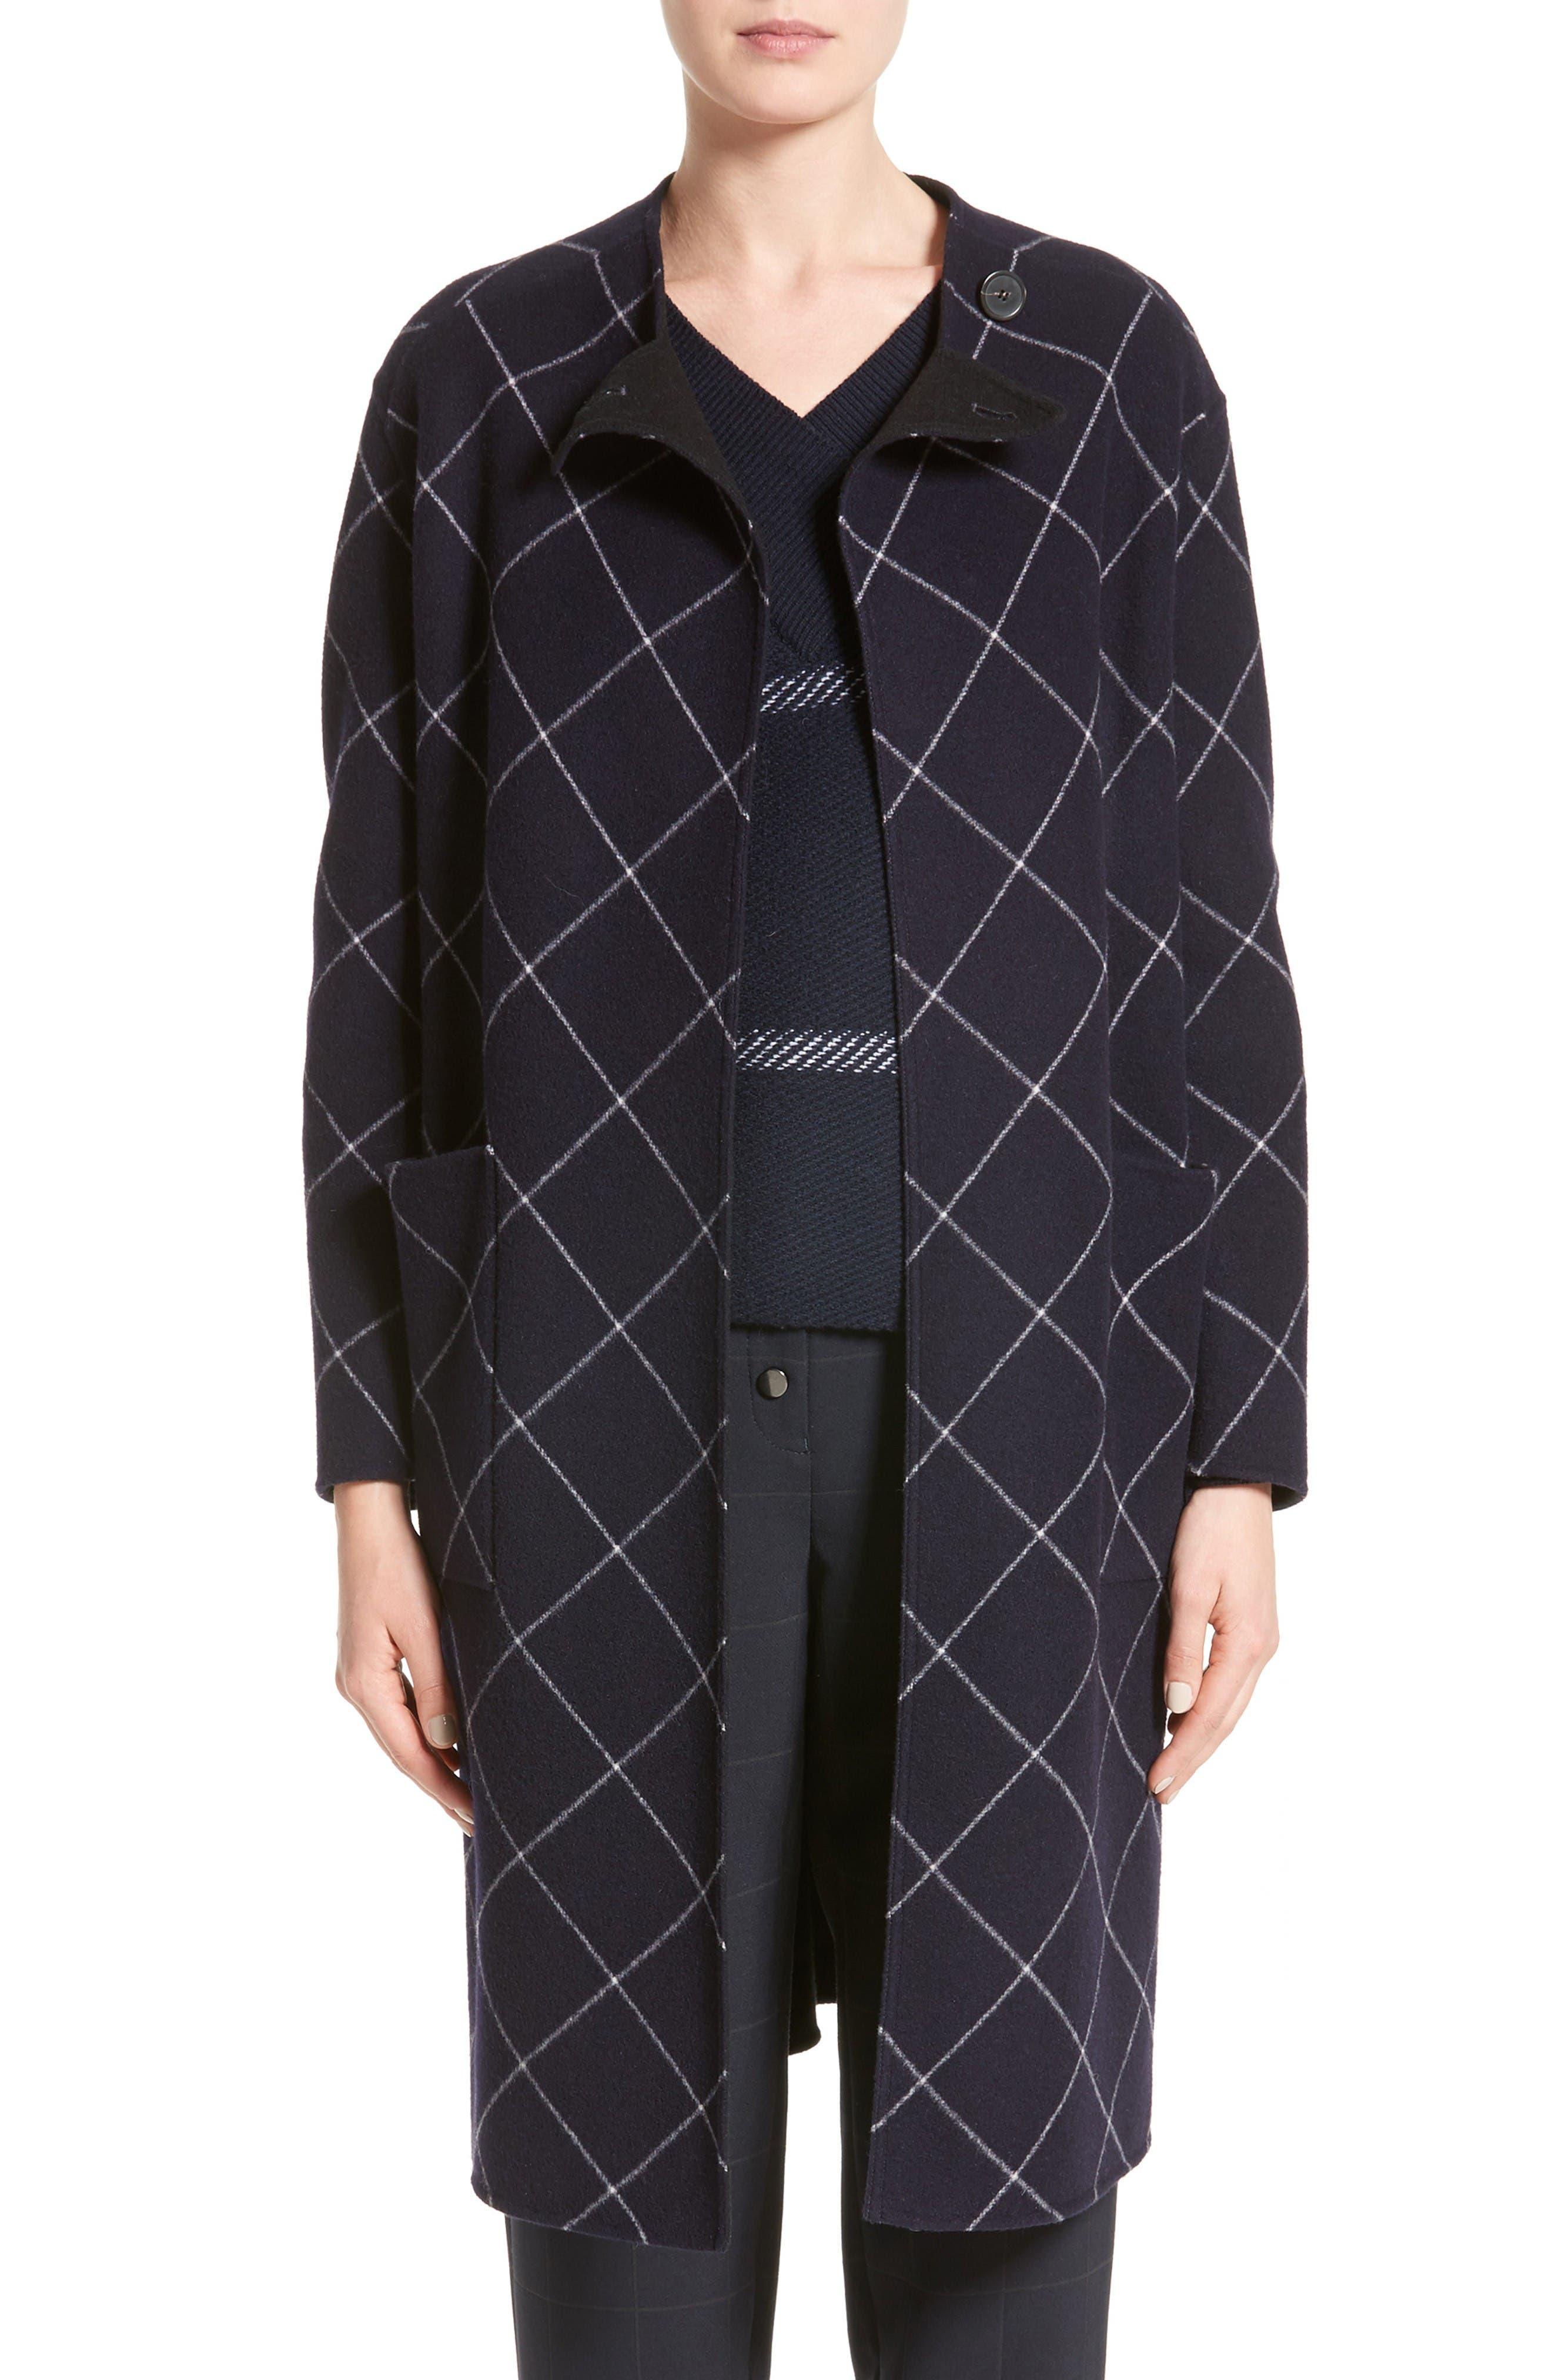 Alternate Image 1 Selected - Armani Collezioni Windowpane Wool & Cashmere Wrap Coat